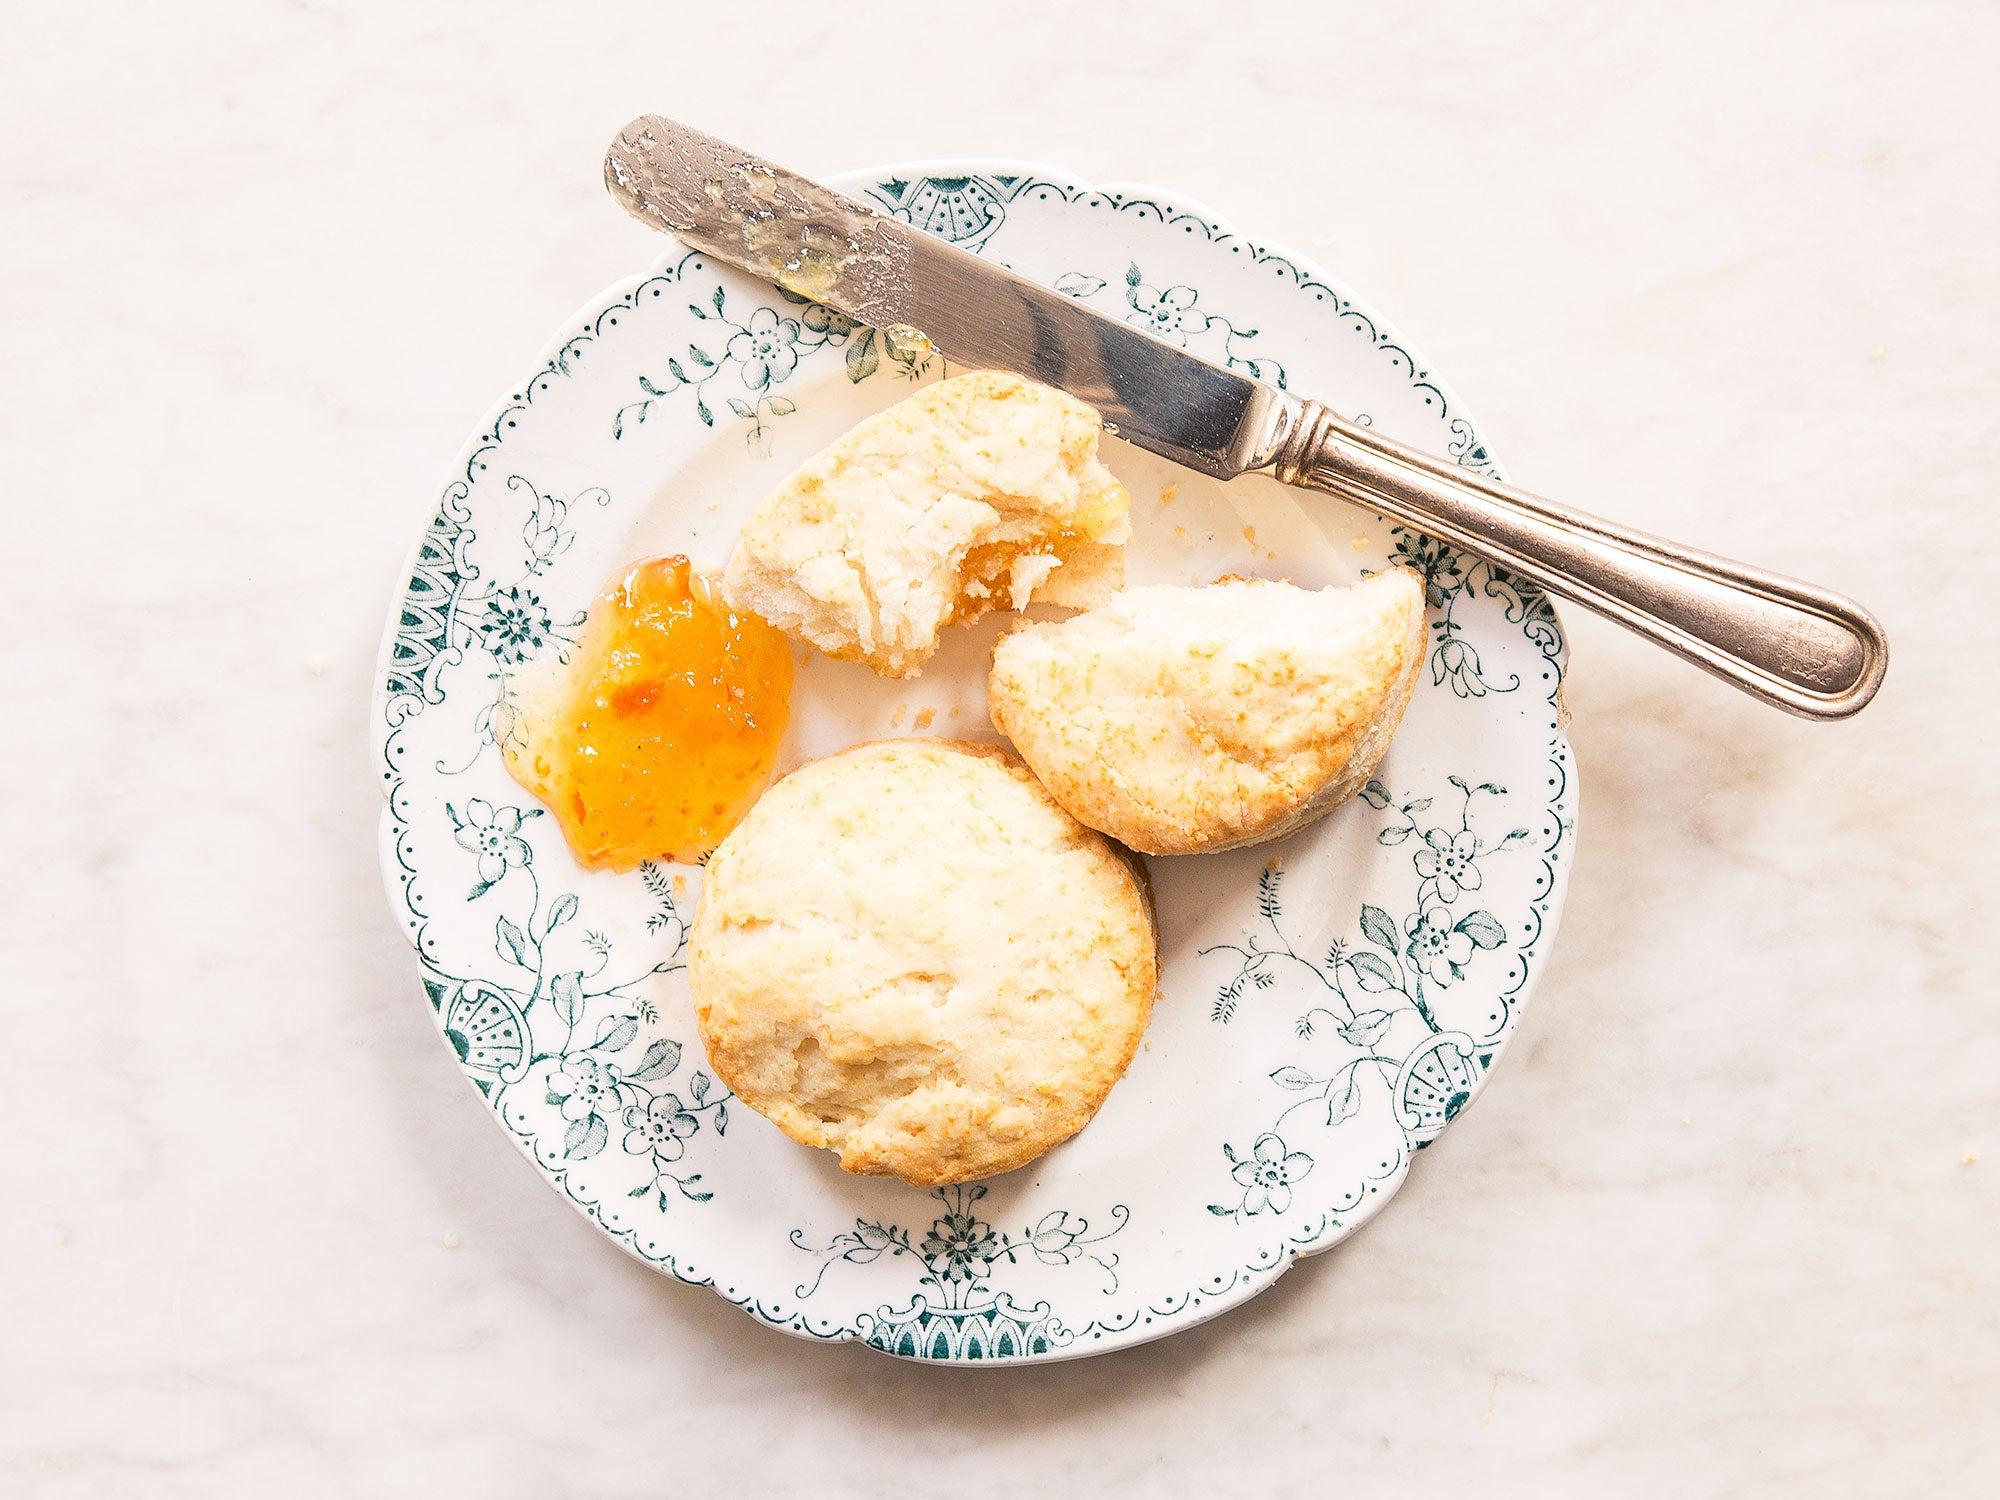 Ruth Reichl's Easy, 4-Ingredient Cream Biscuits